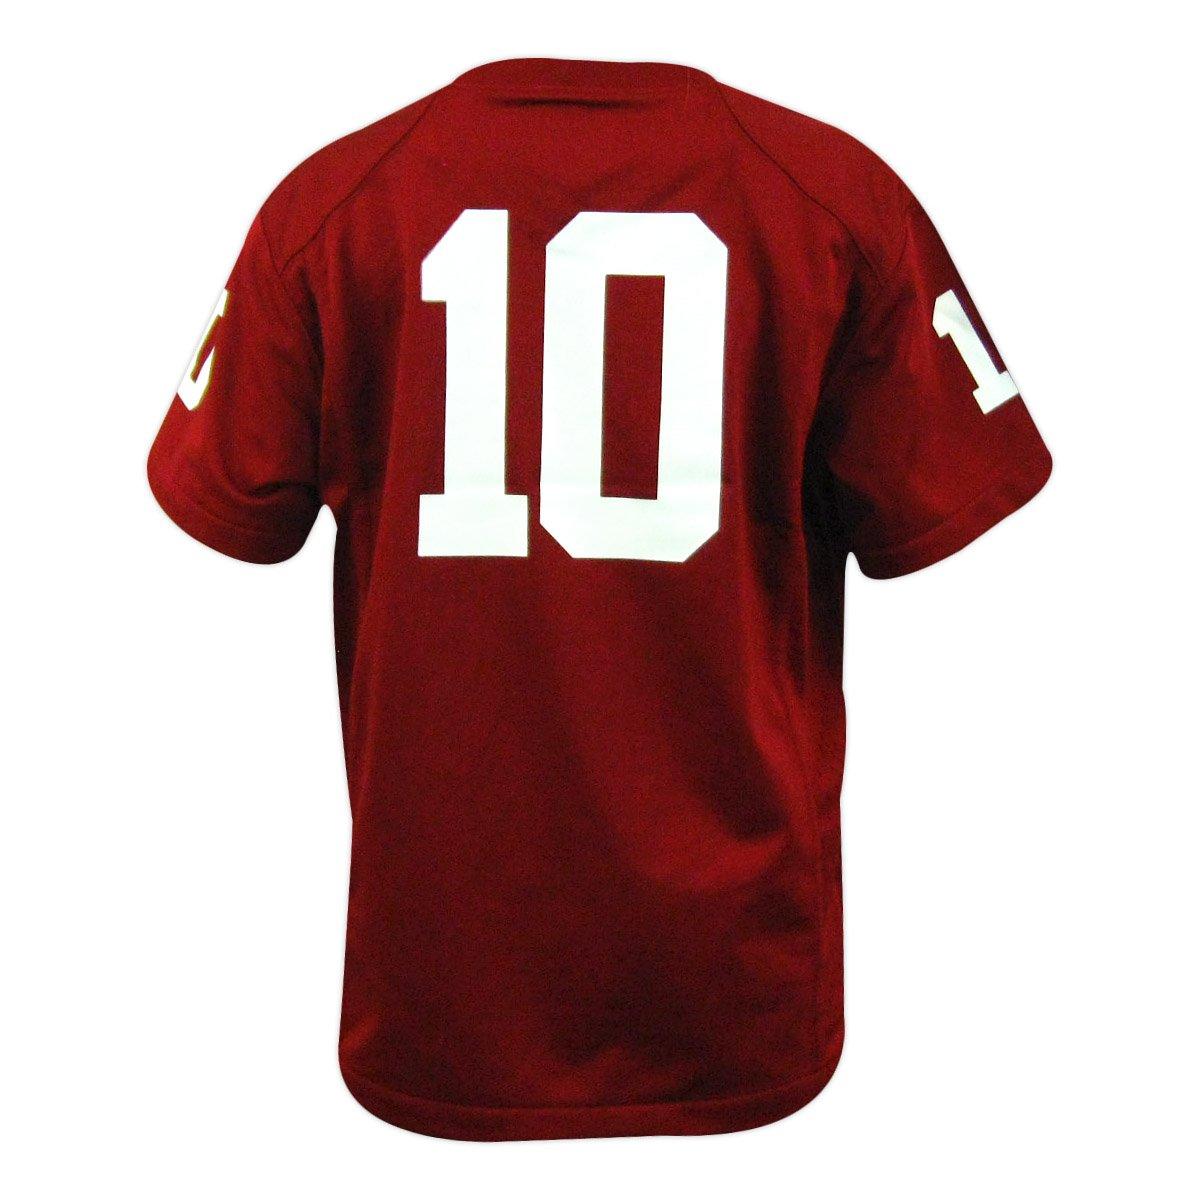 competitive price d6070 e3c53 Nike Oklahoma Sooners NCAA Youth Replica Football Jersey Crimson #10 (4)